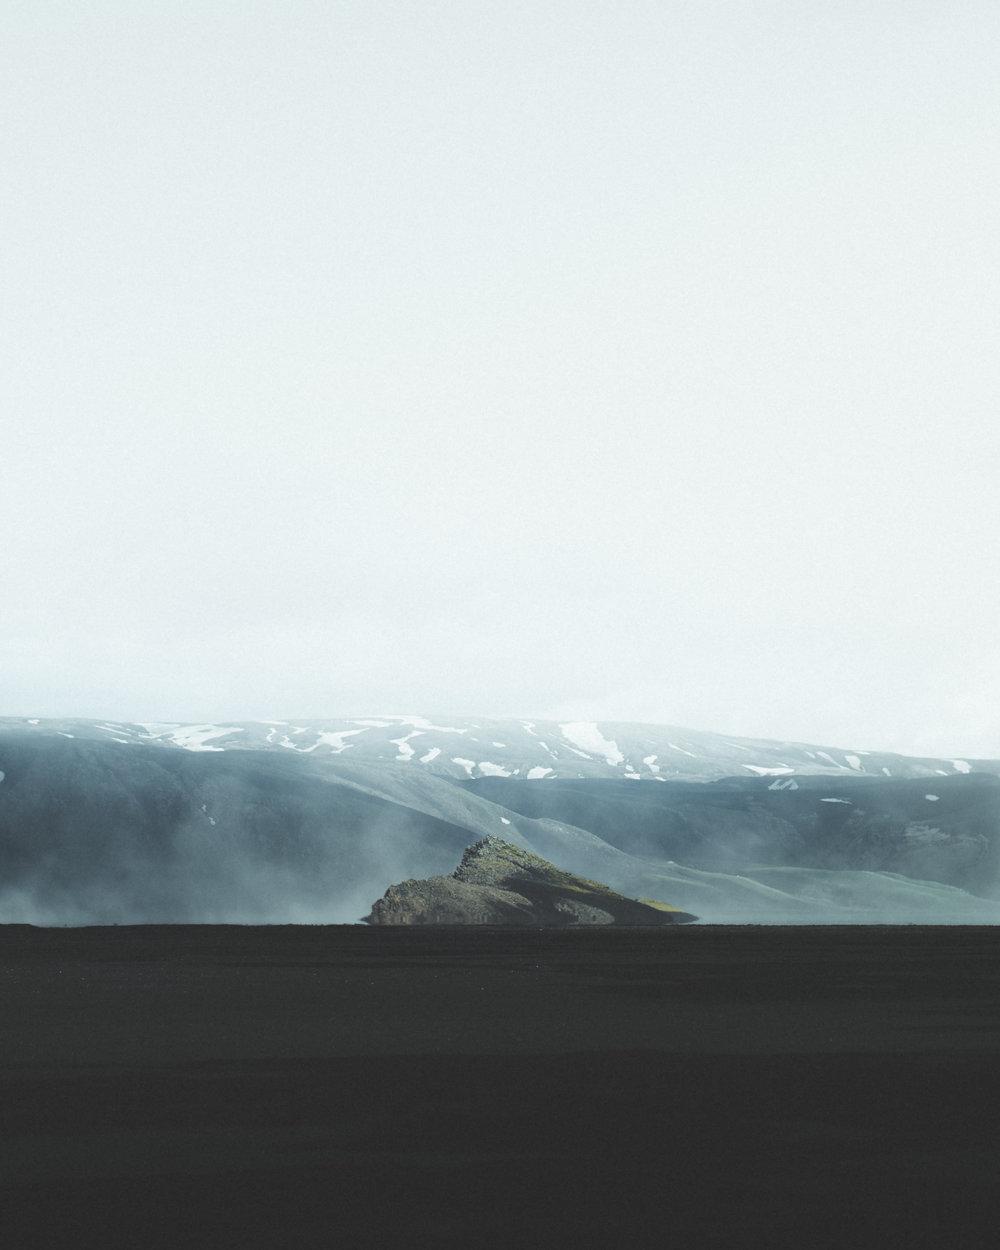 iceland-photography-benjamin-hardman-ísland-landscape-untitled_DSC1426.jpg